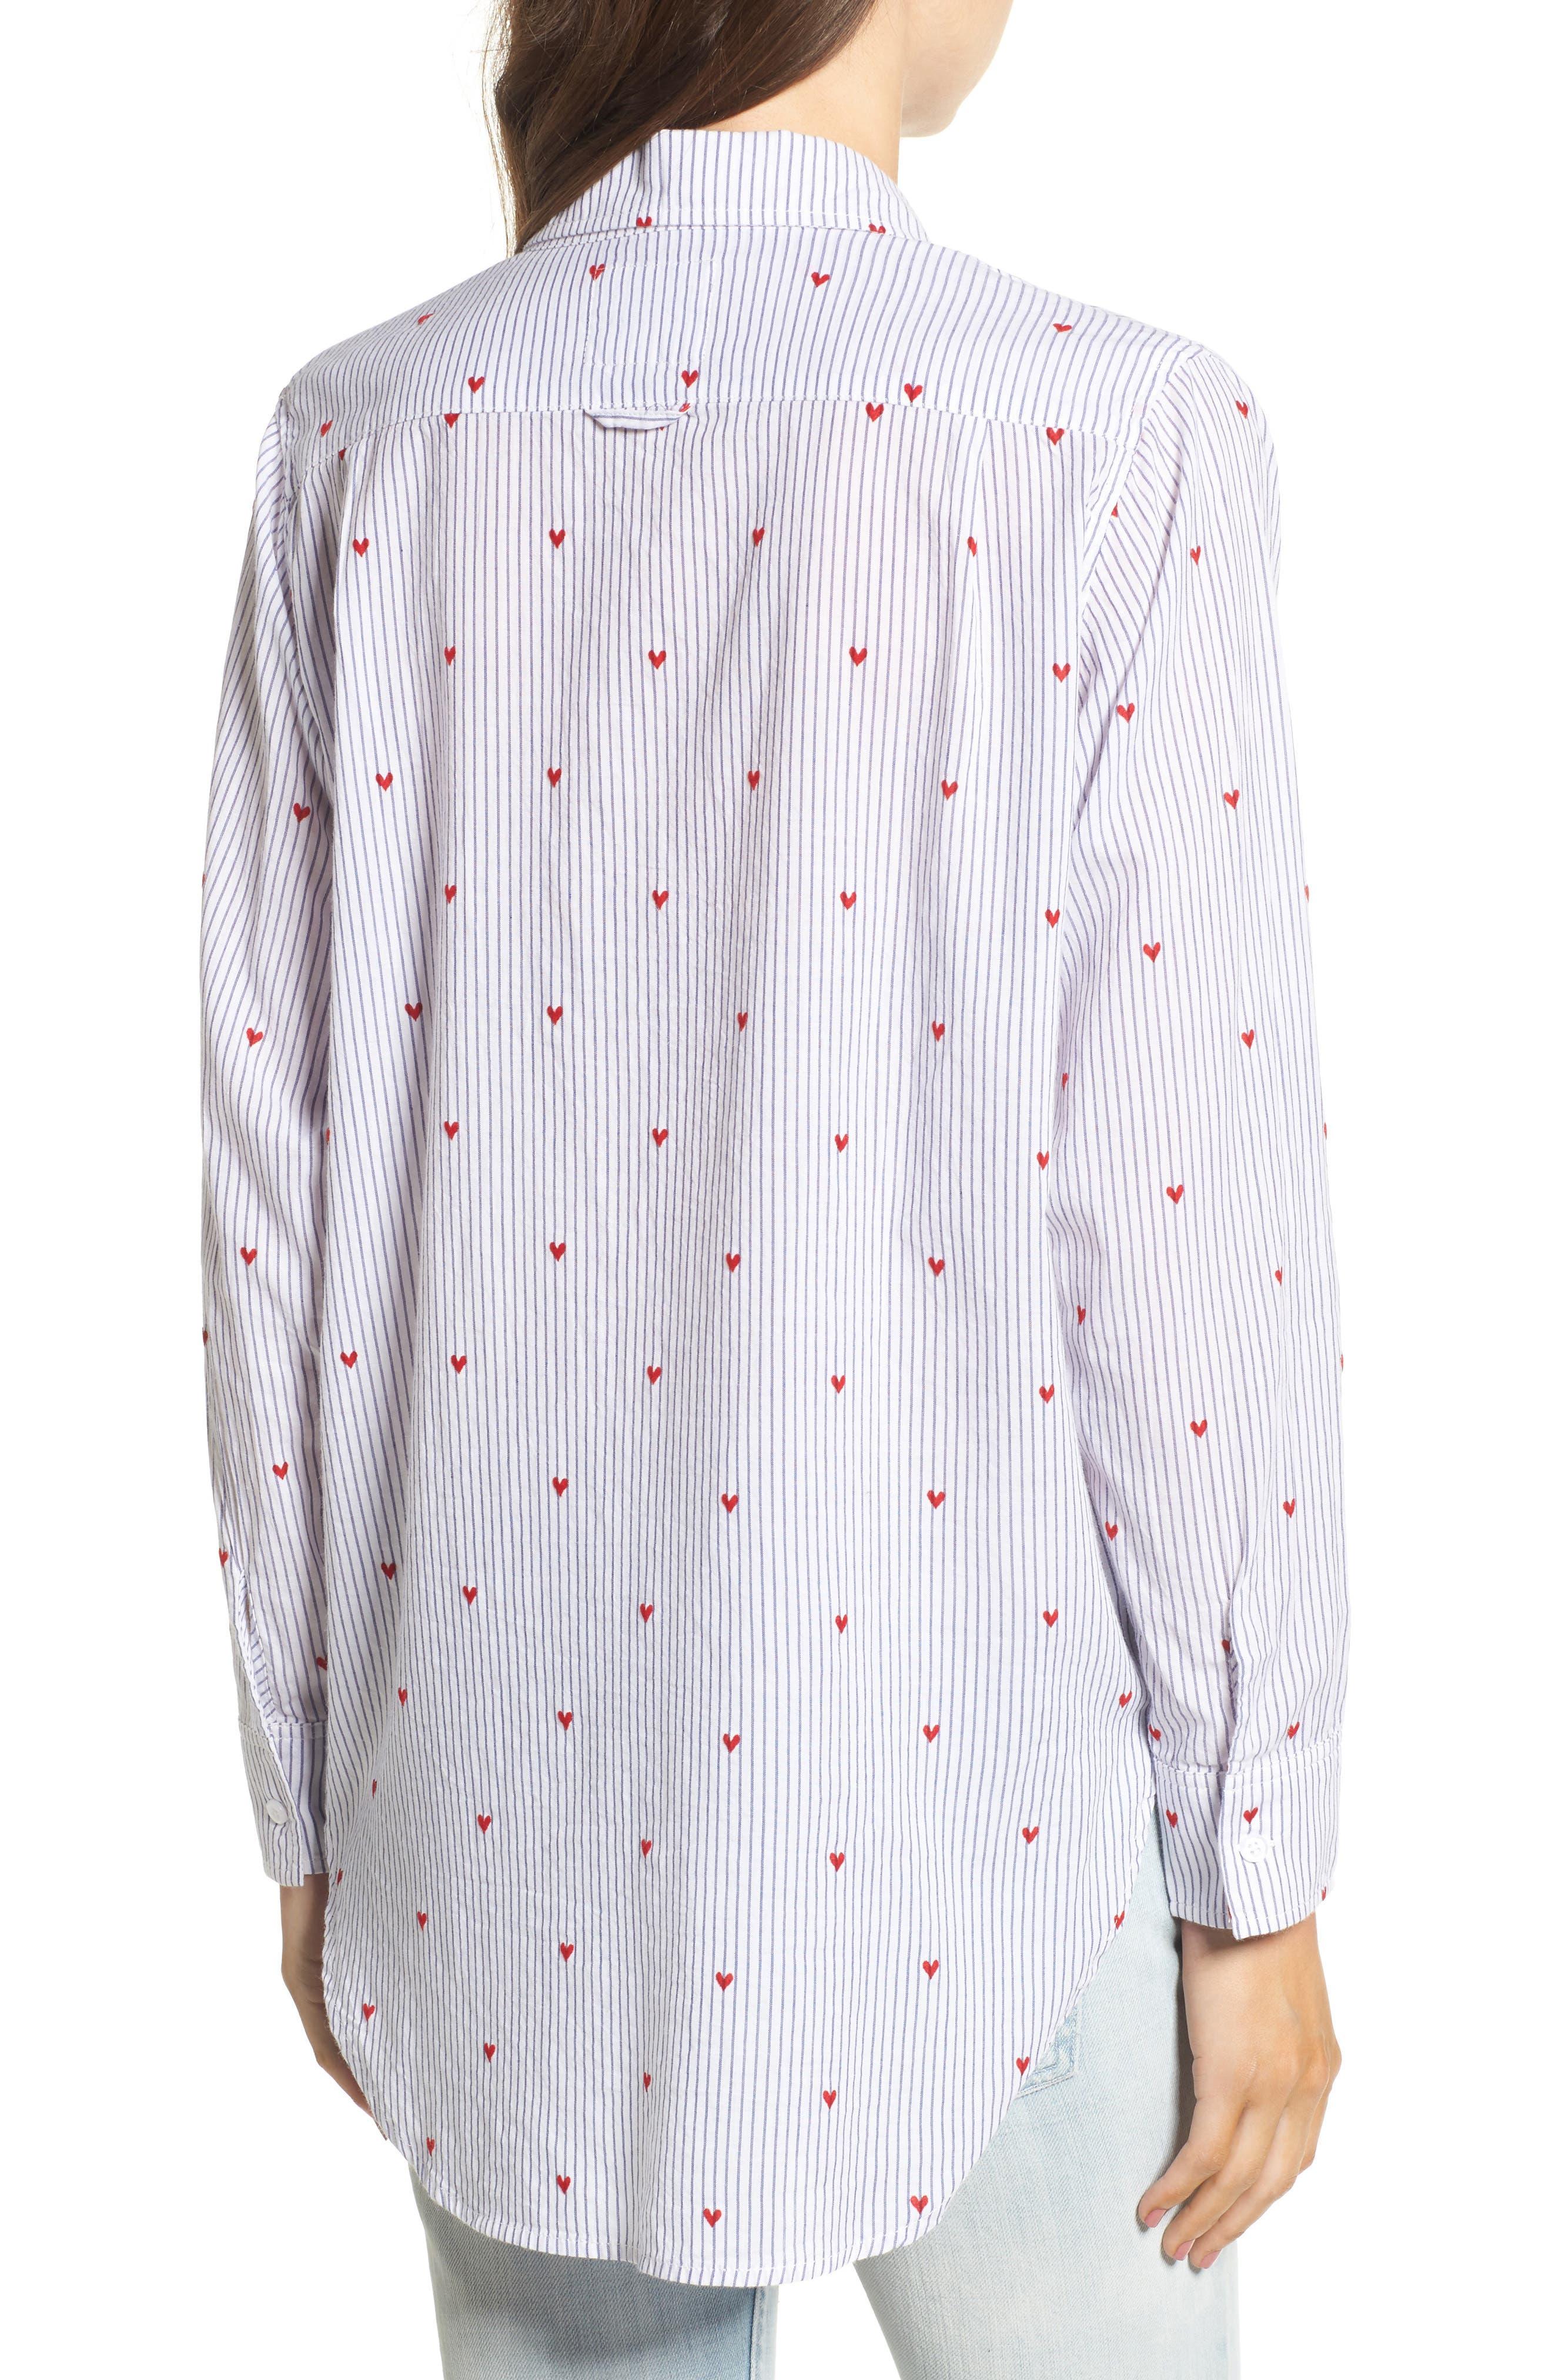 Taylor Heart Stripe Shirt,                             Alternate thumbnail 2, color,                             400